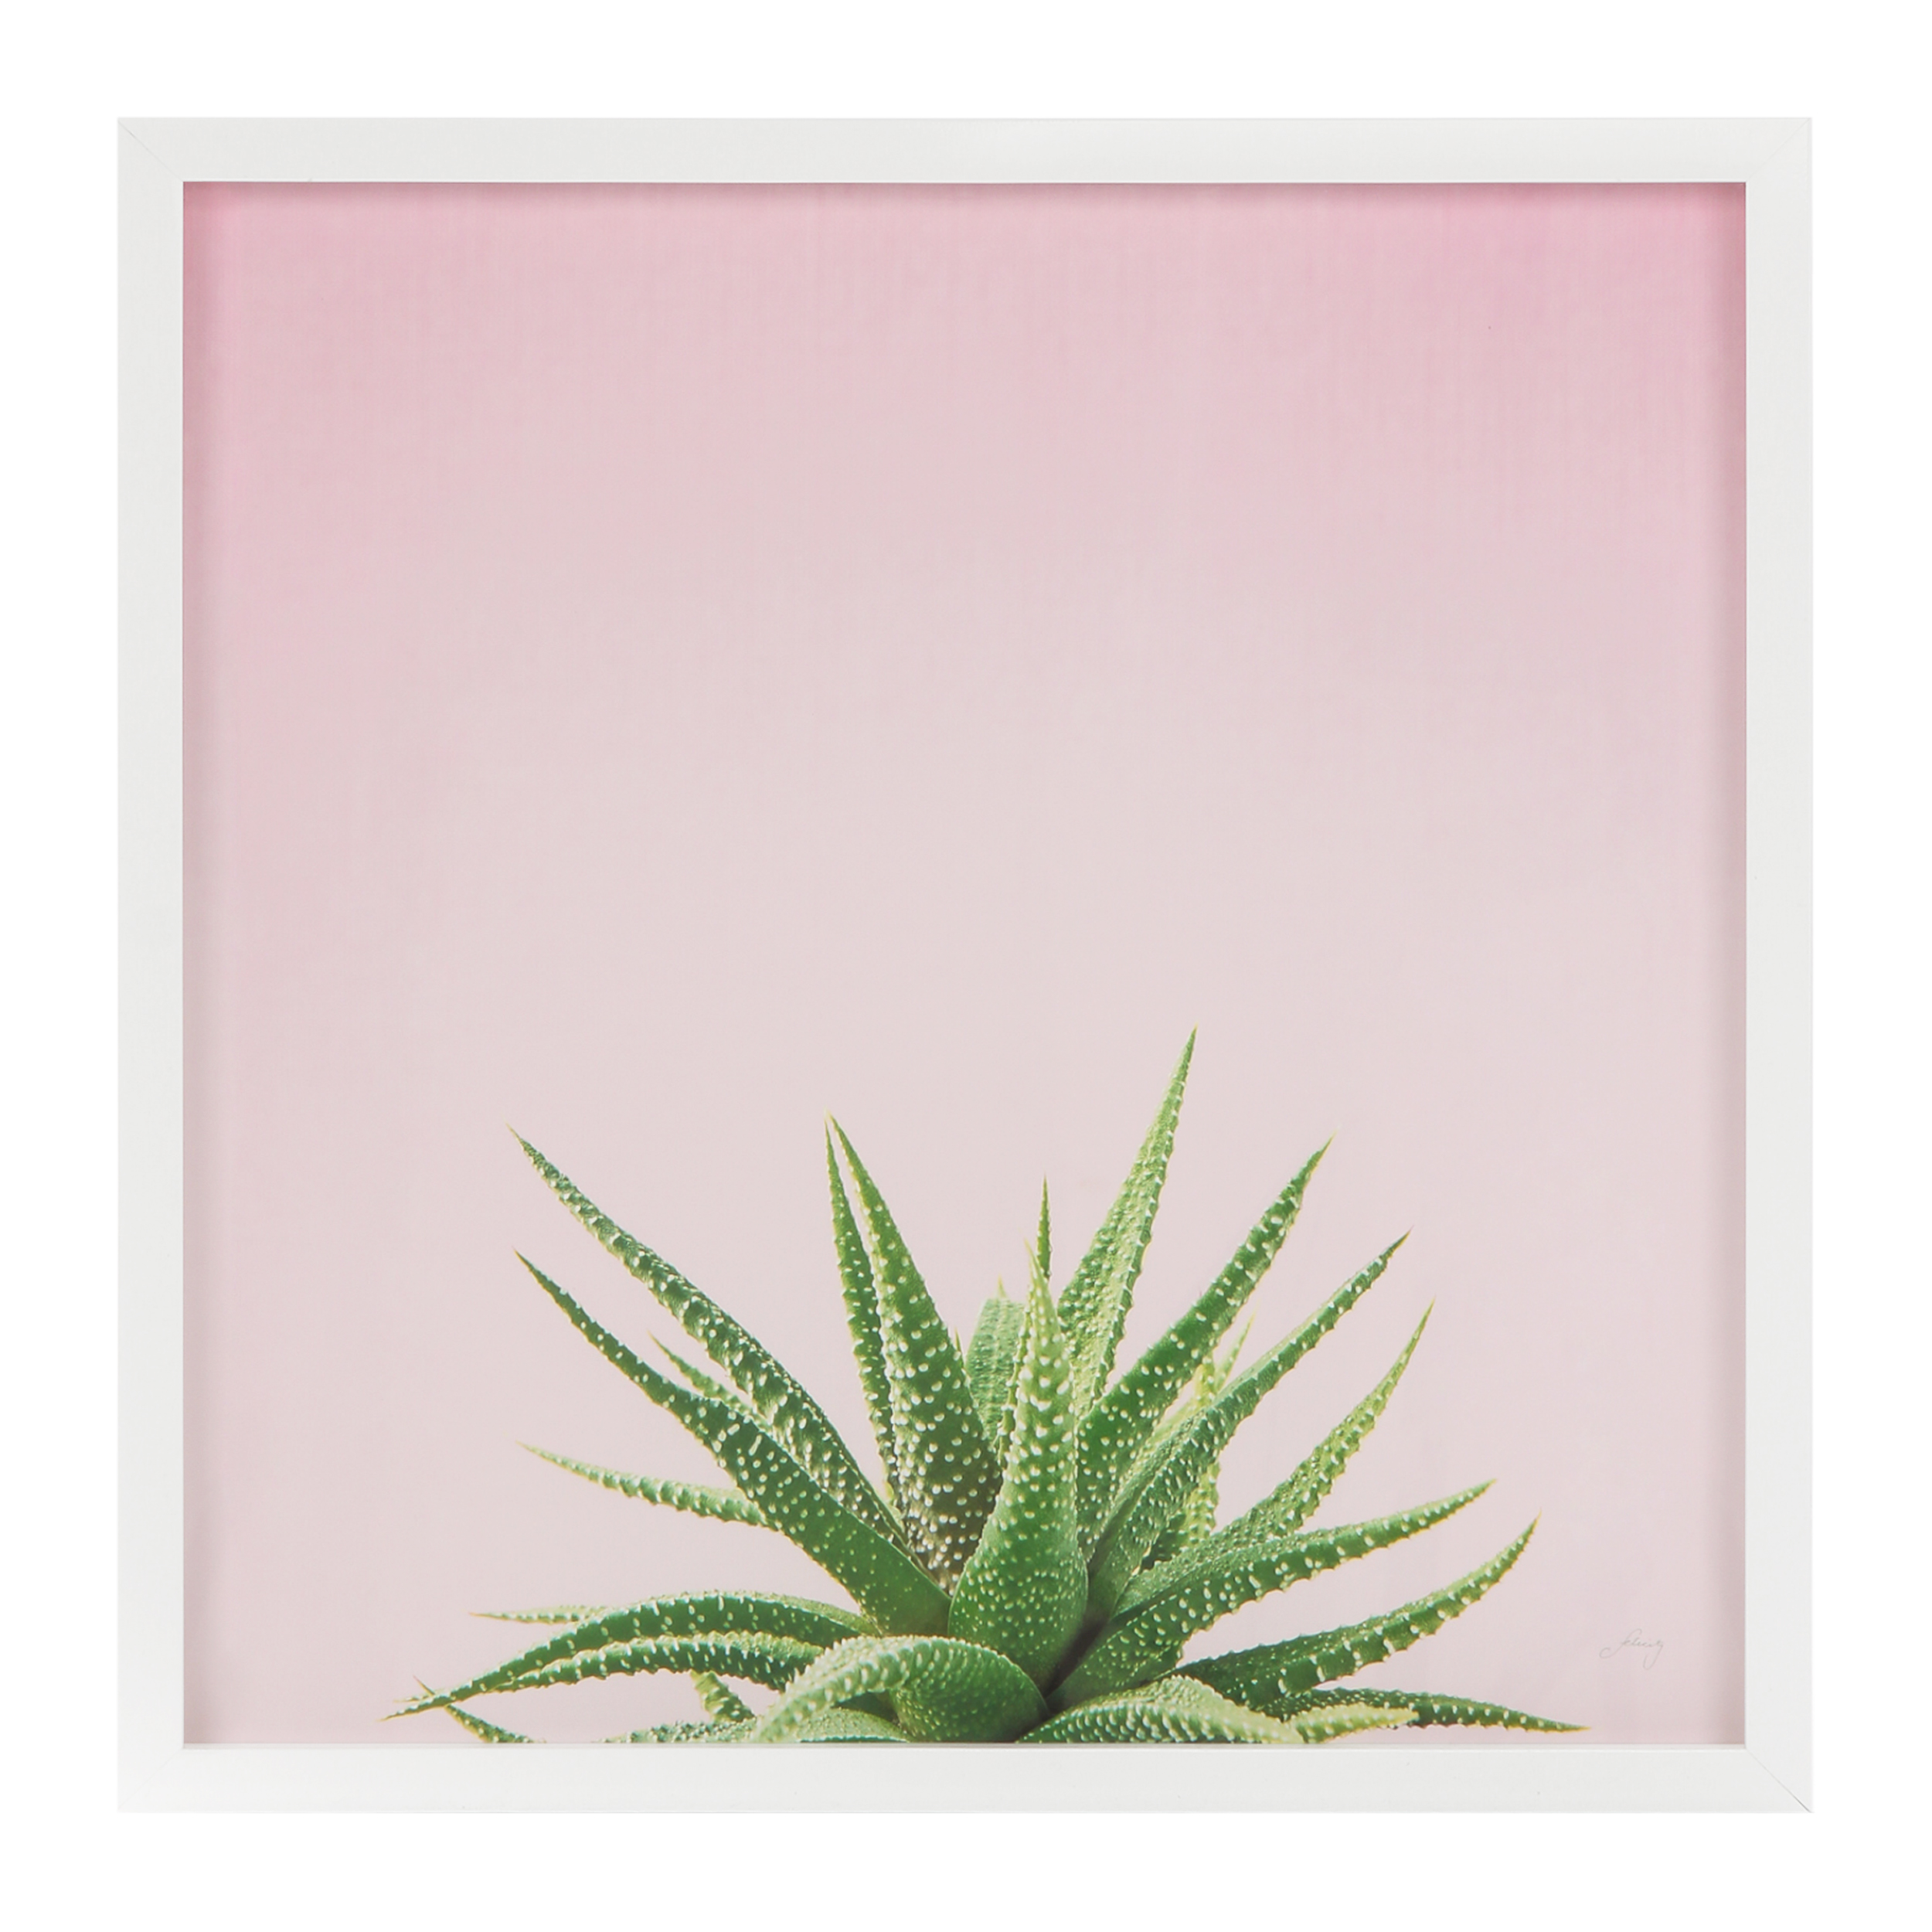 Постер AloeКартины<br><br><br>stock: 5<br>Ширина: 74,4<br>Цвет: Разноцветный<br>Длина: 74,4